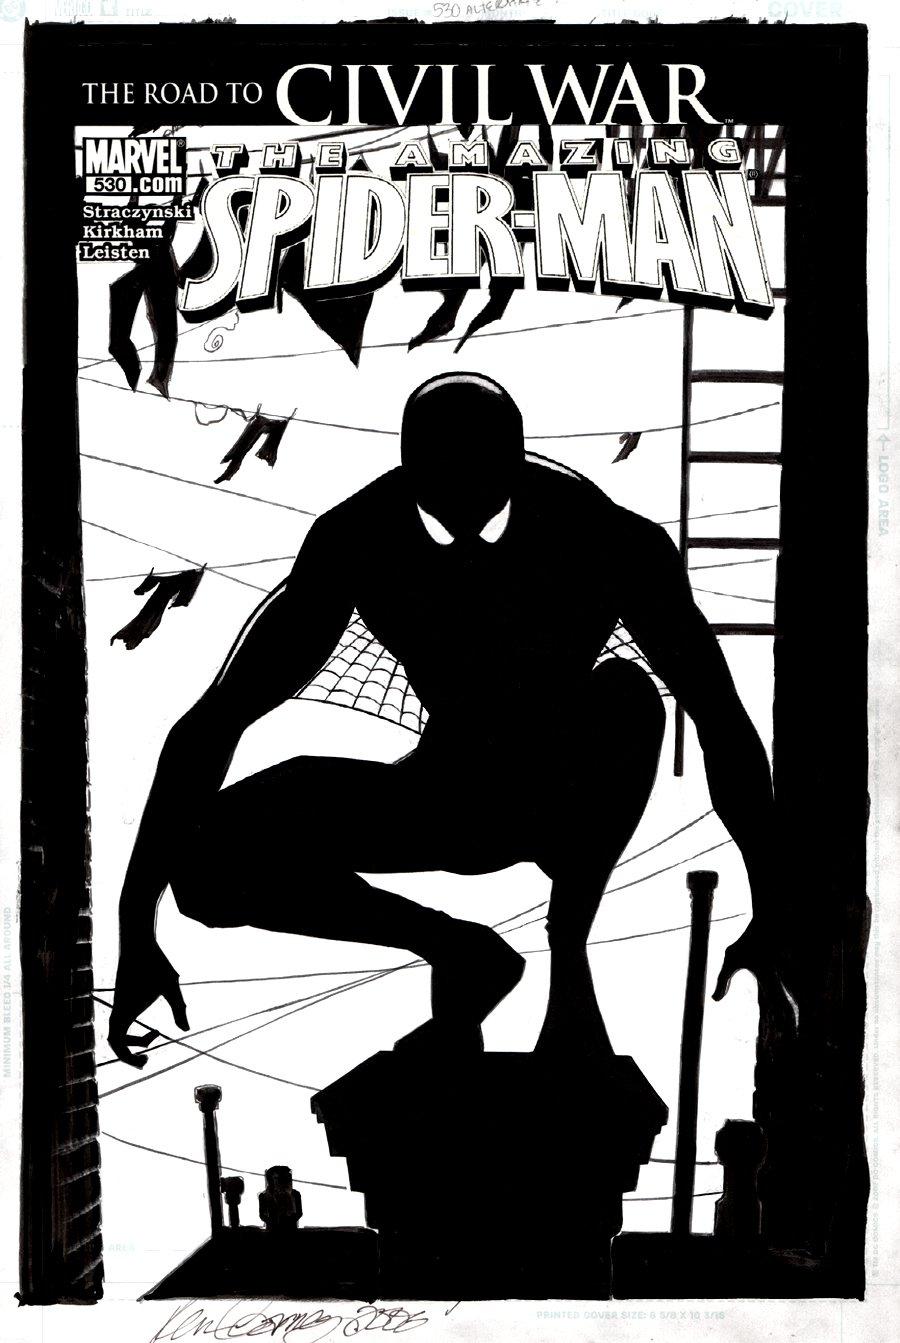 Amazing Spider-Man #530 'Alternate' Civil War Cover (2006)